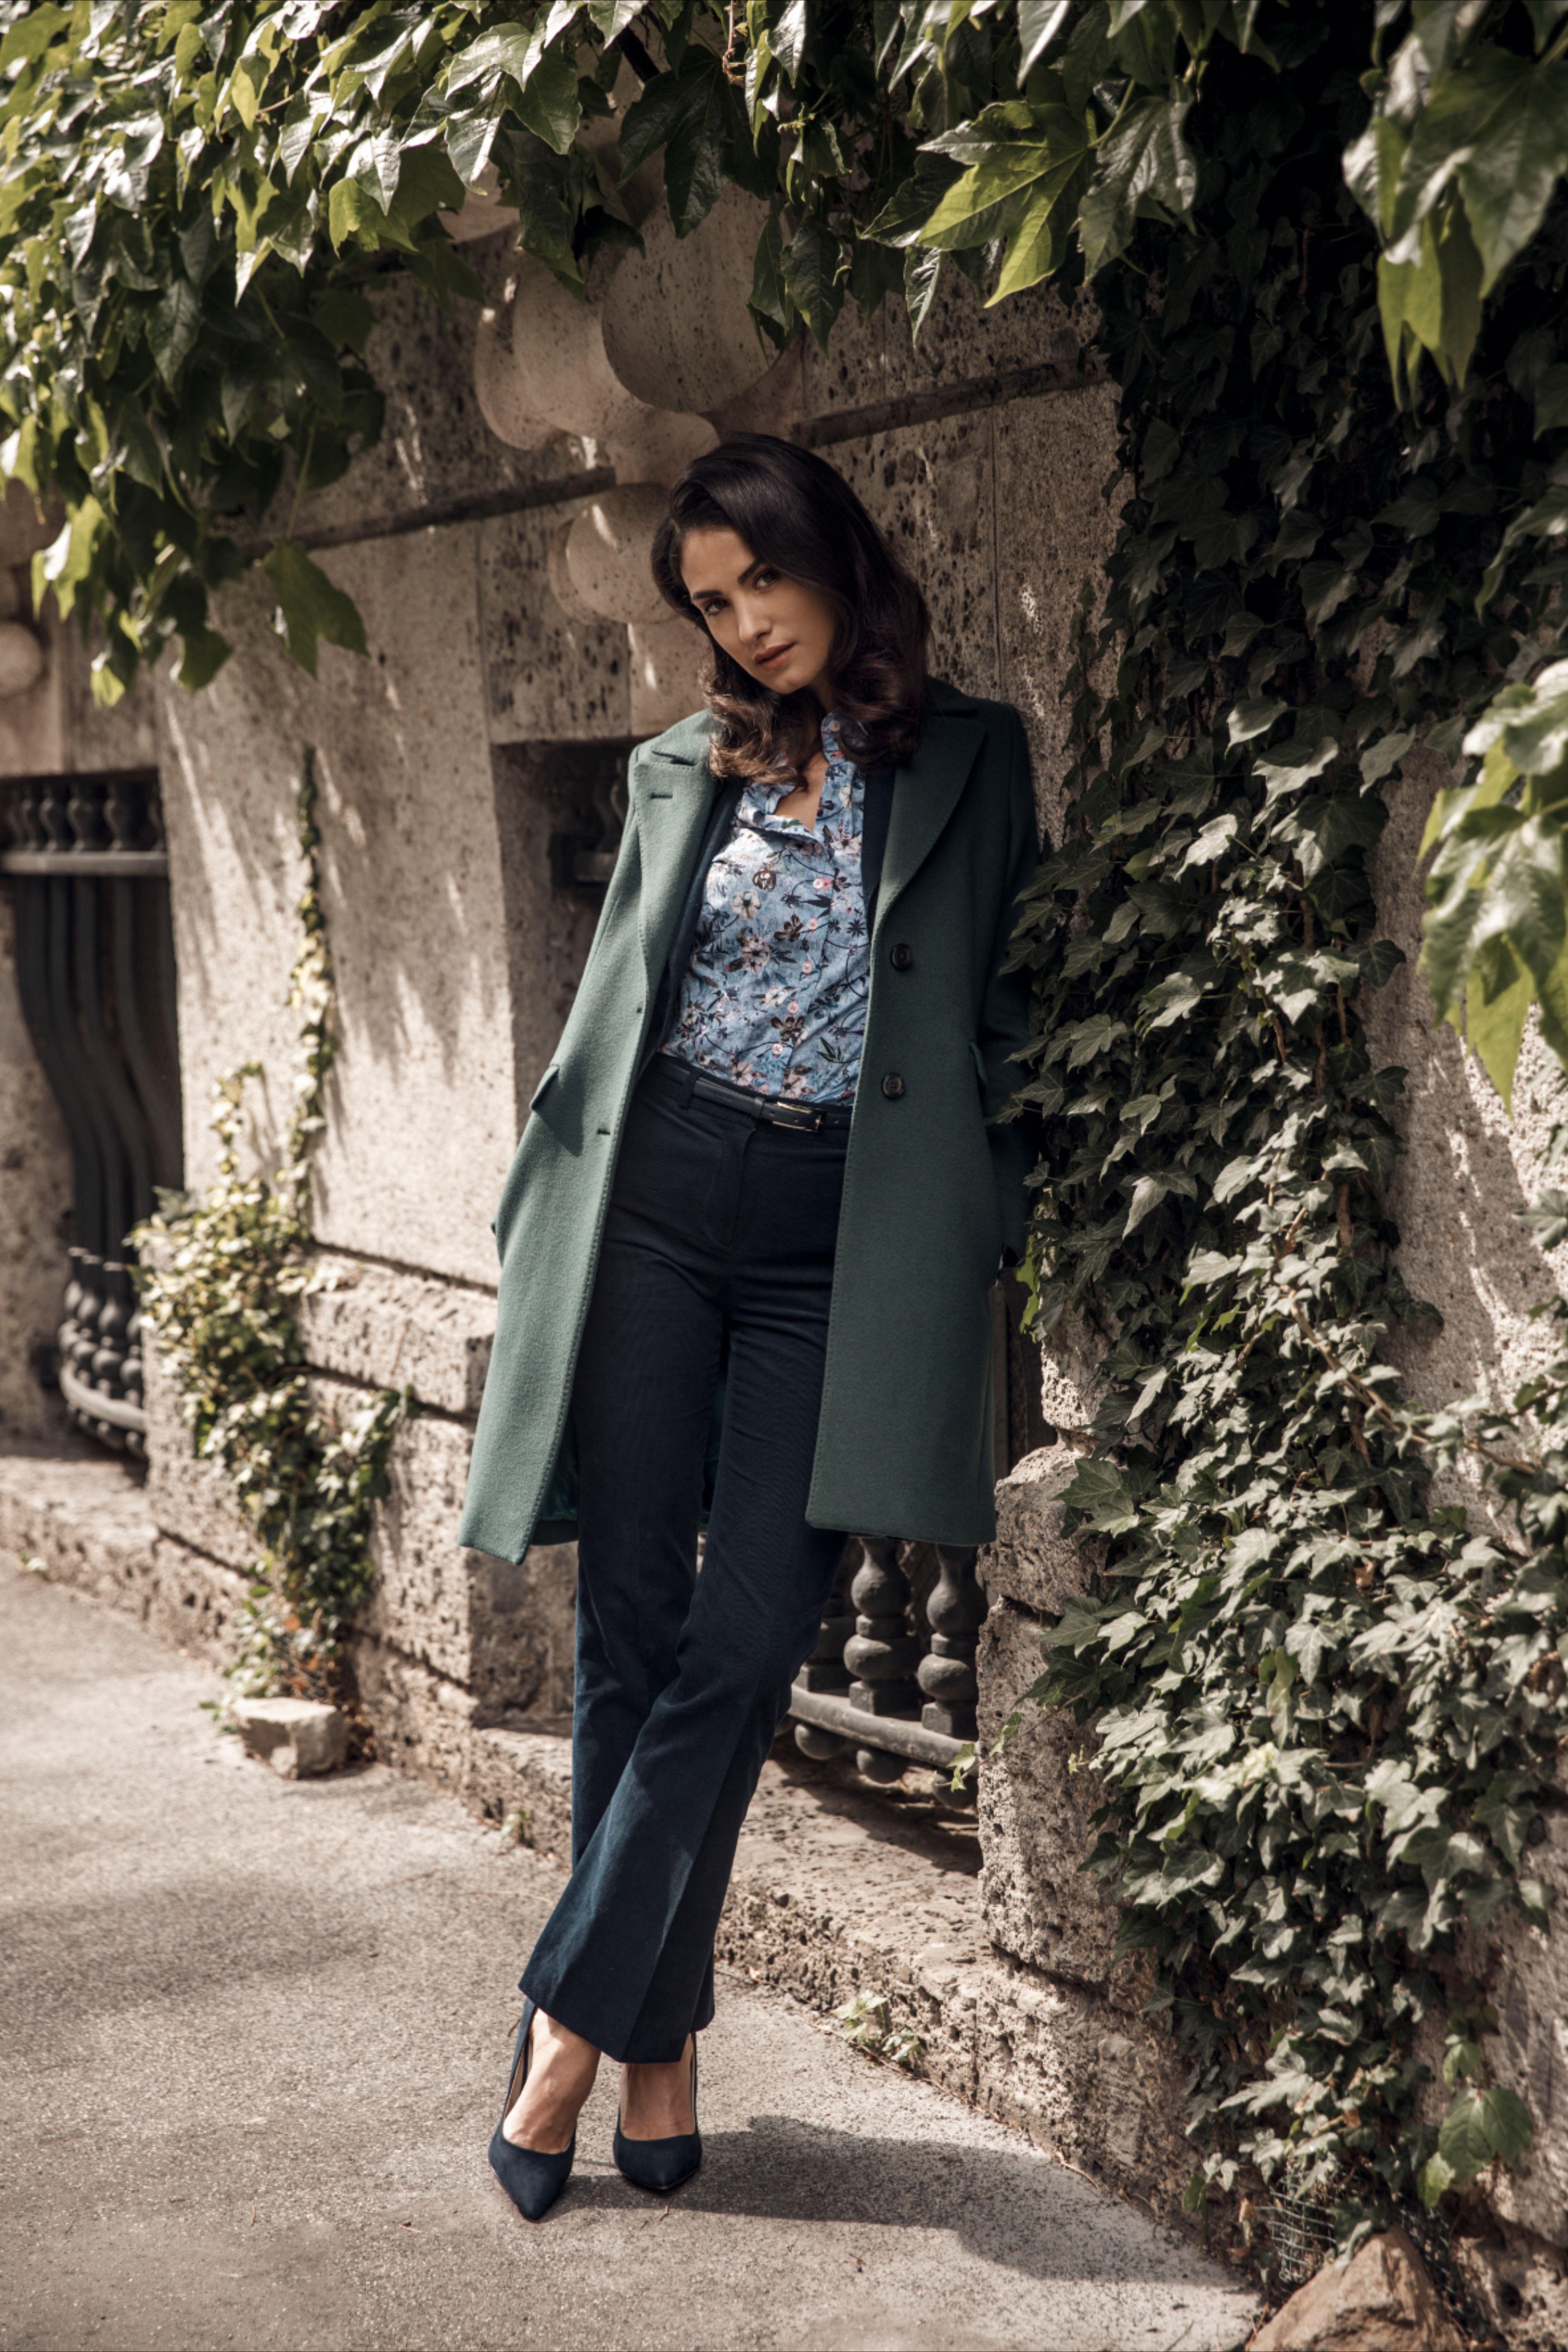 Beautiful Italian women's coat Cavallaro Napoli in 2020